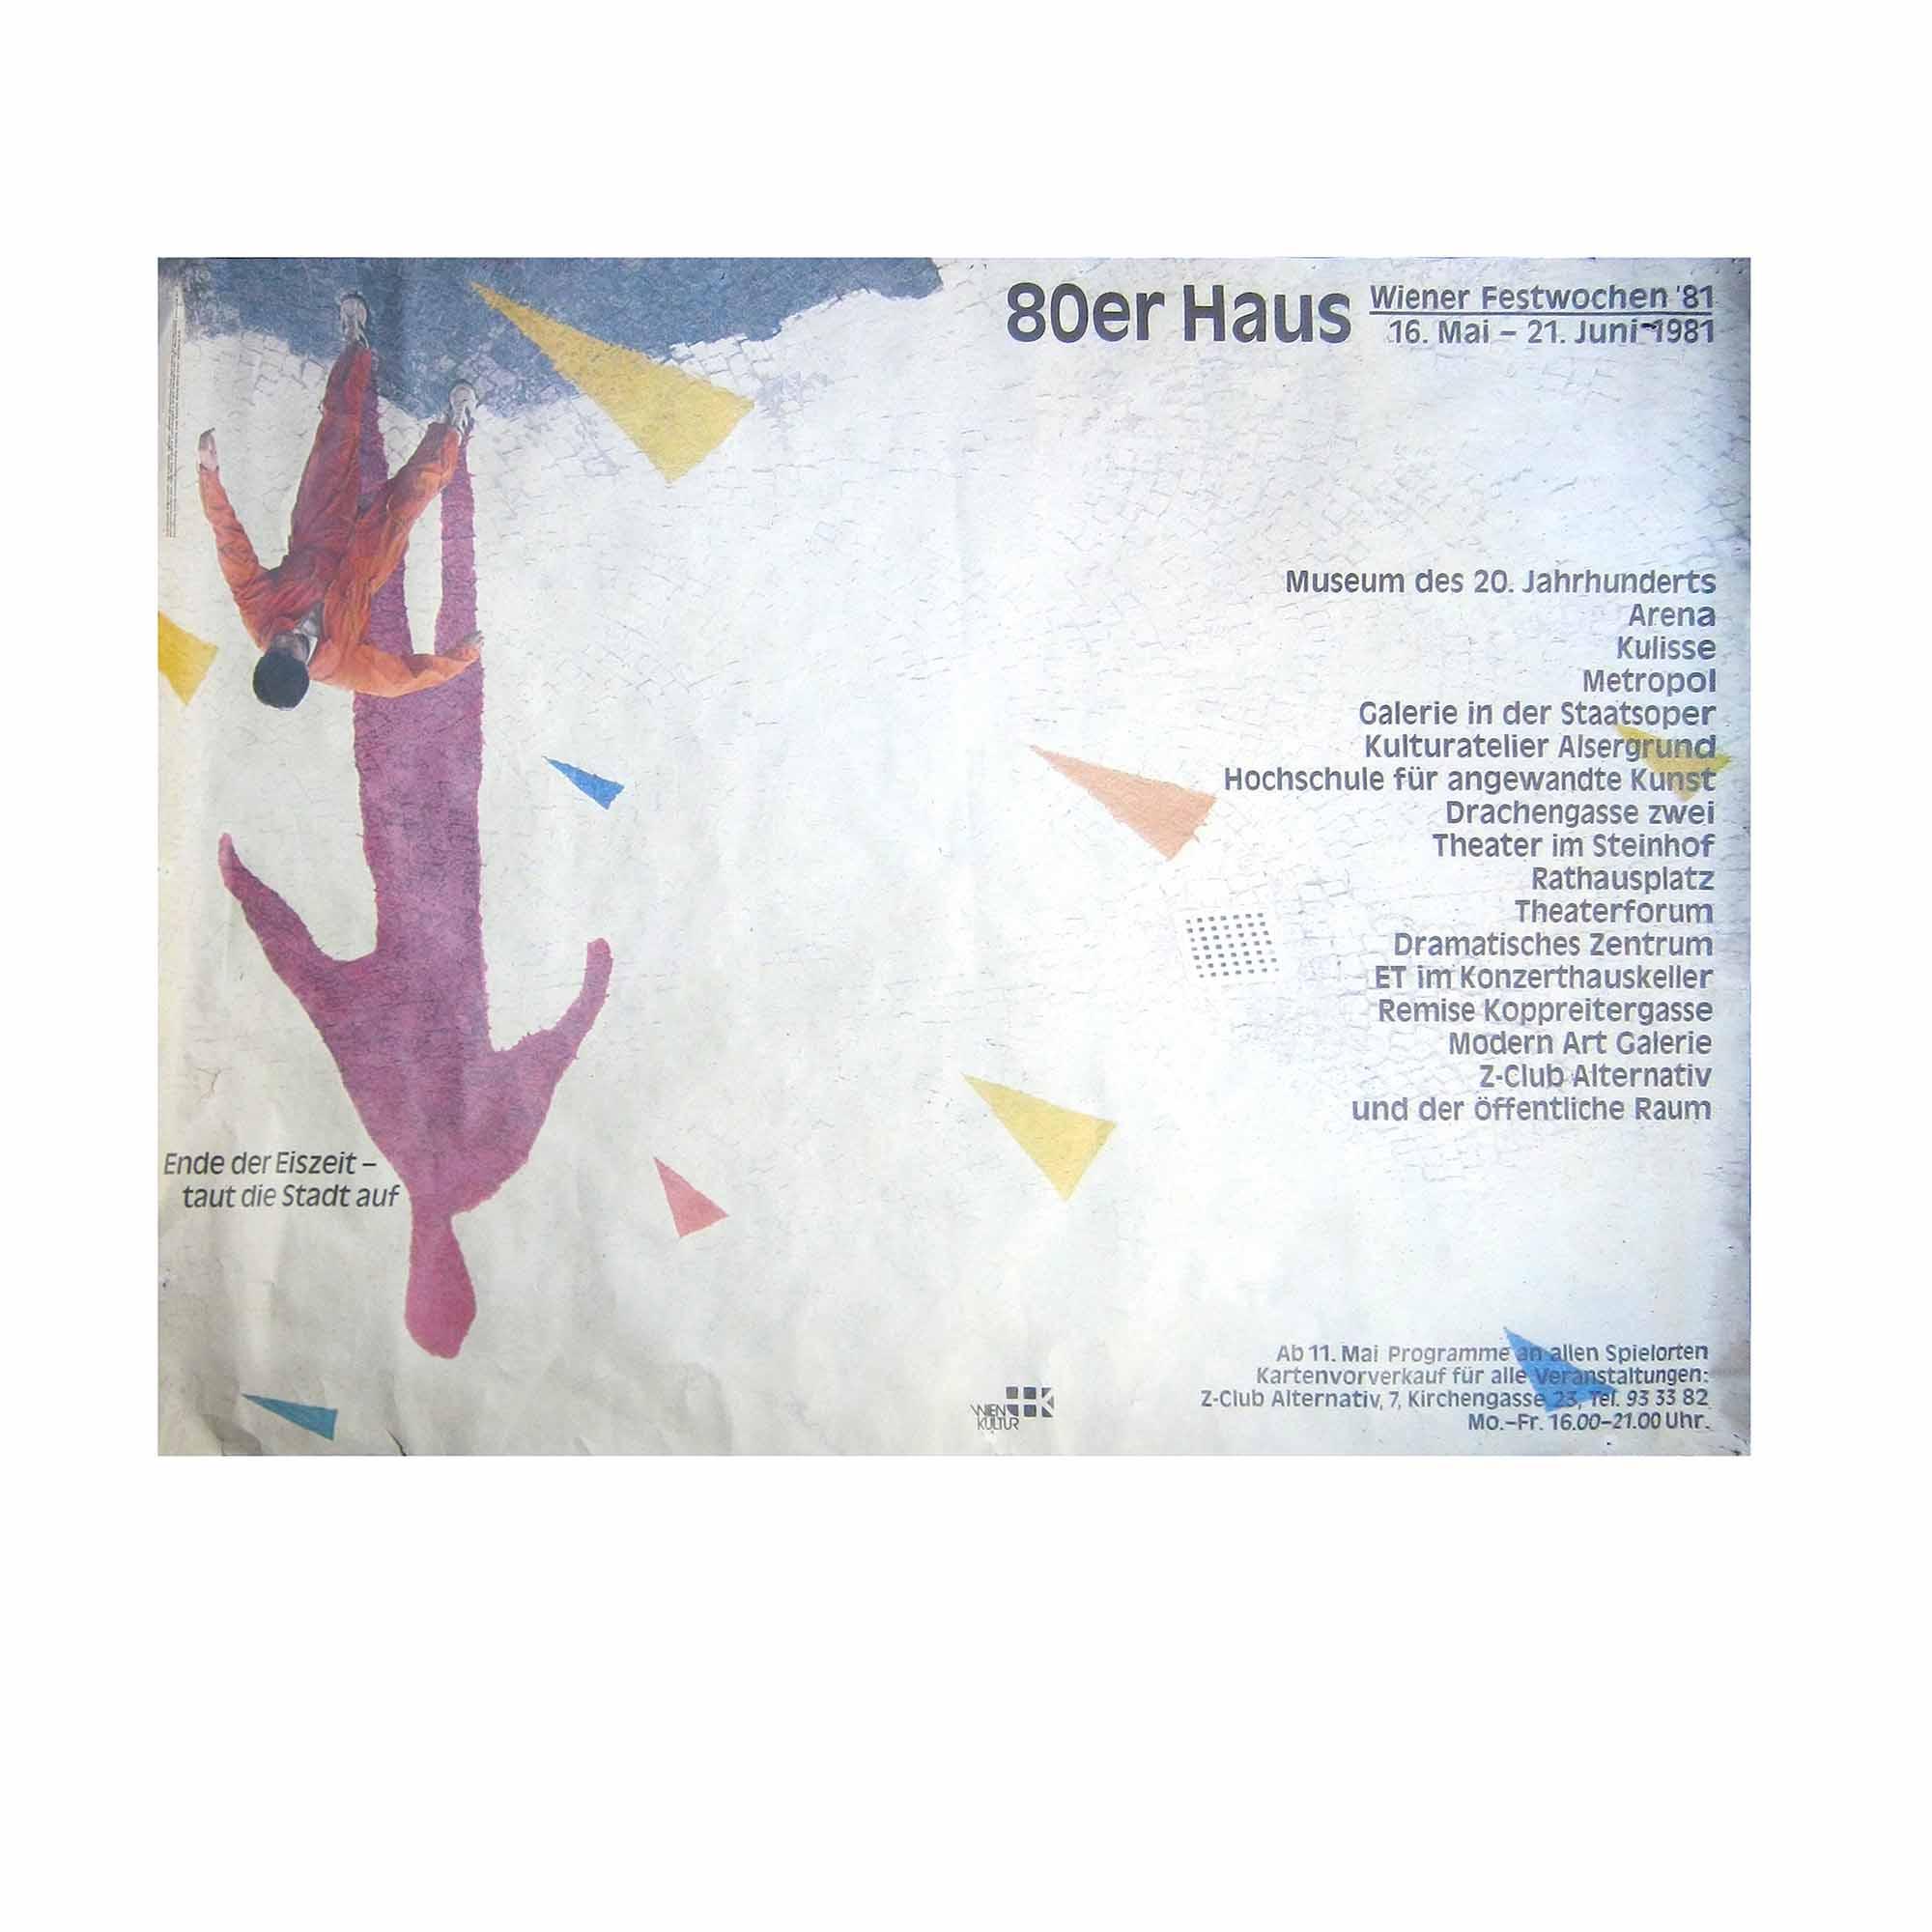 8043-Gmeiner-Wiener-Festwochen-1981-N.jpg